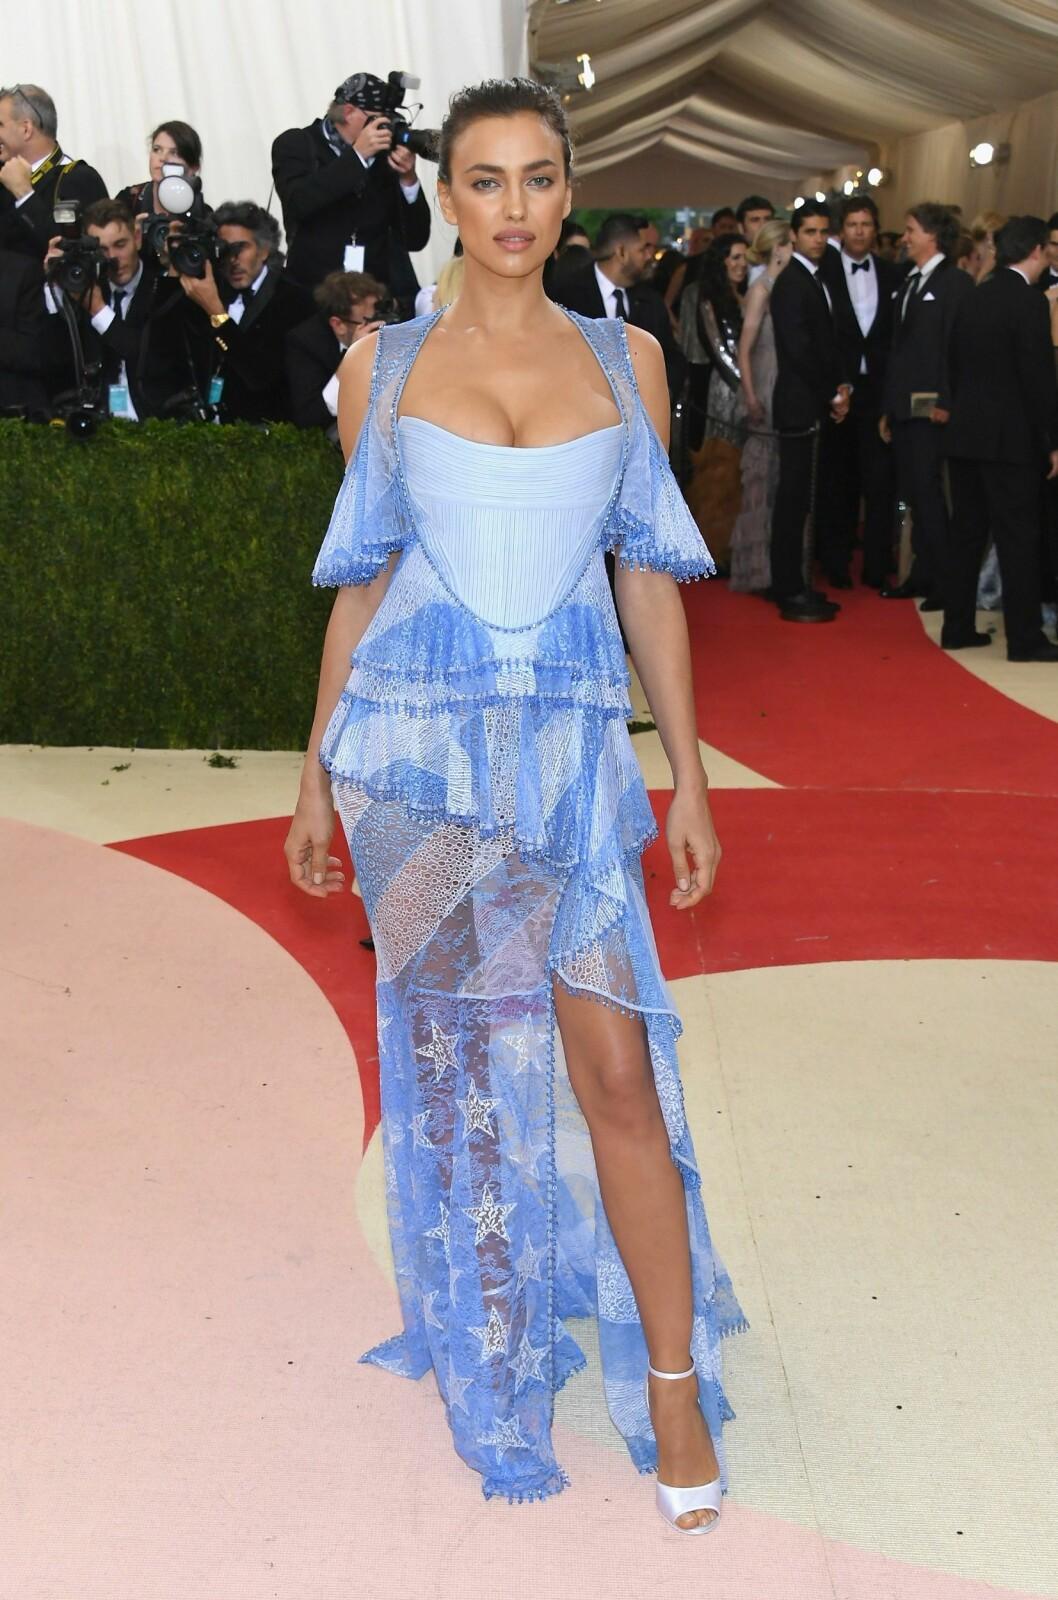 LITE FLATTERENDE: Flere medier påpeker at Givenchy-kjolen til supermodell Irina Shayk ikke var et heldig valg.  Foto: Afp